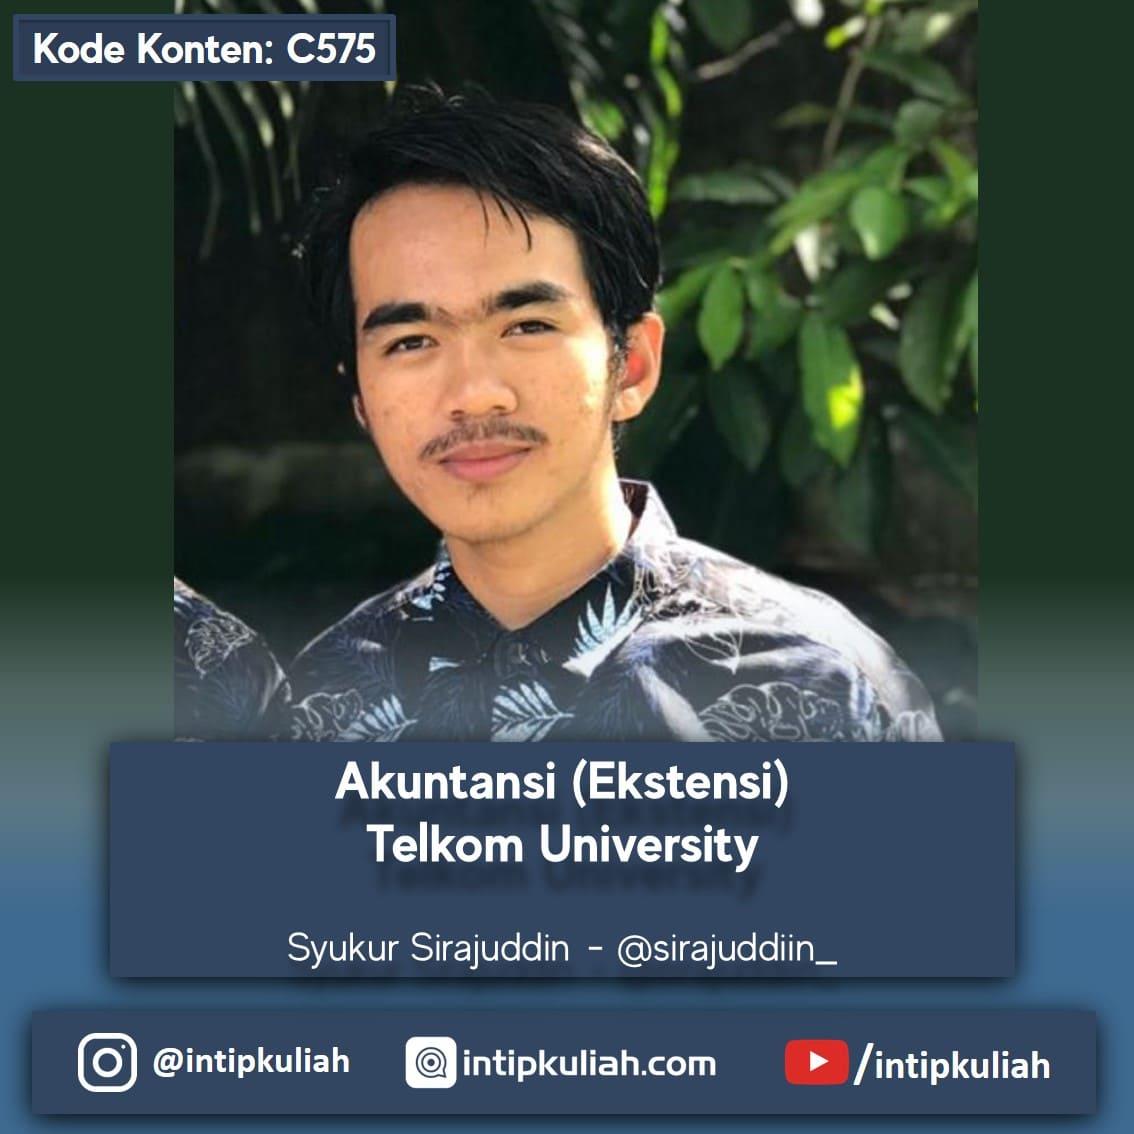 S1 Akuntansi (Ekstensi) Telkom University (Syukur)